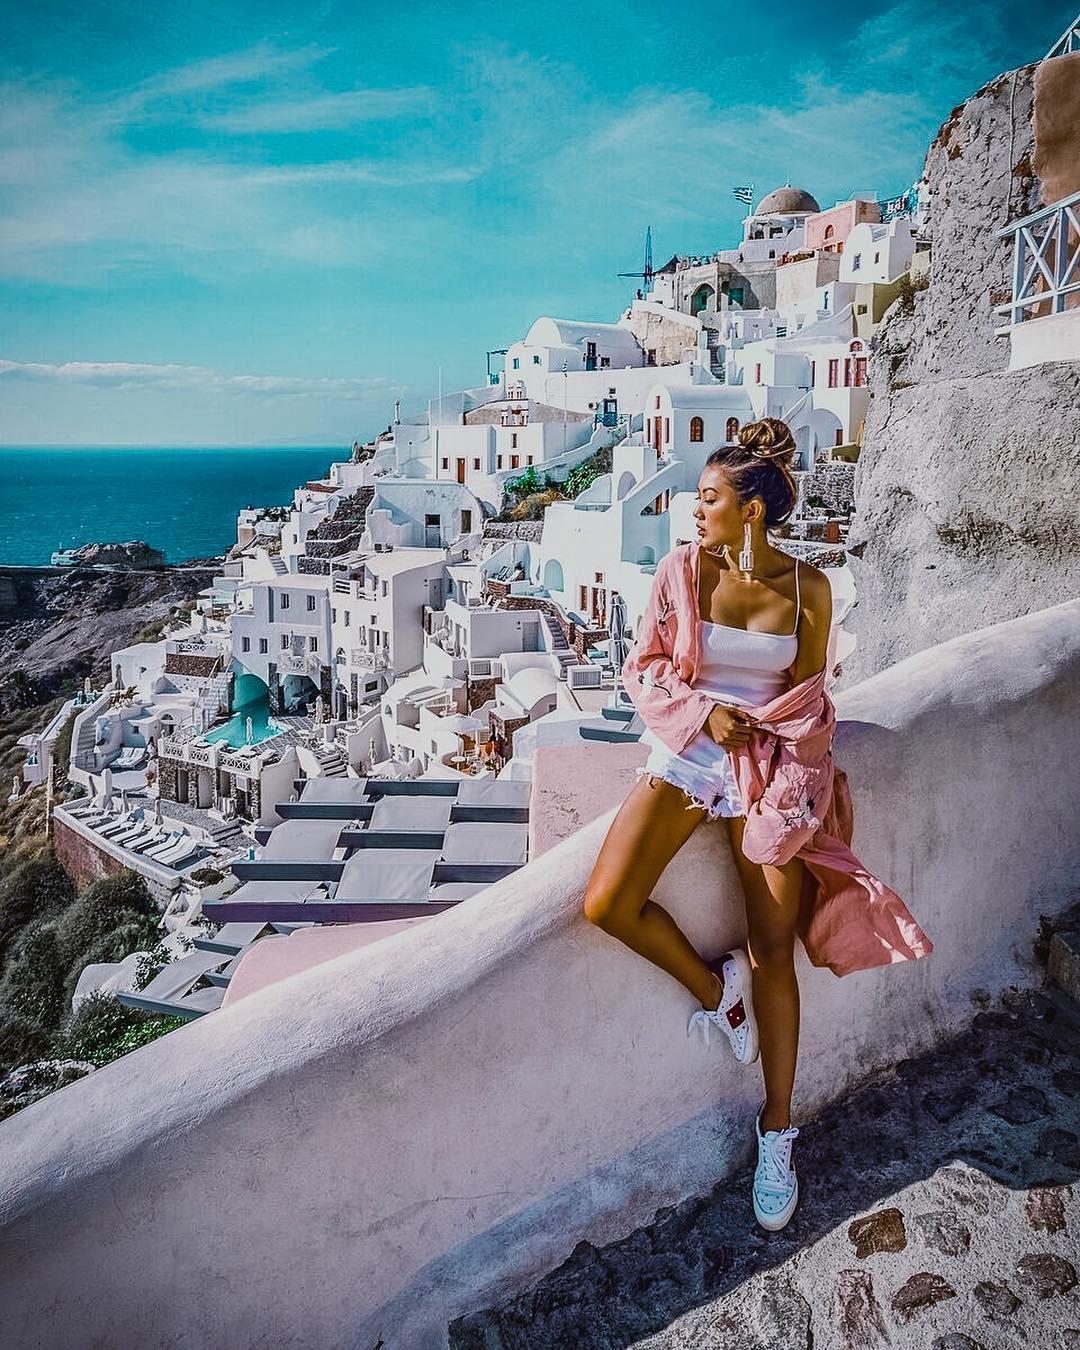 Pink Kimono For Santorini Trip This Summer 2020